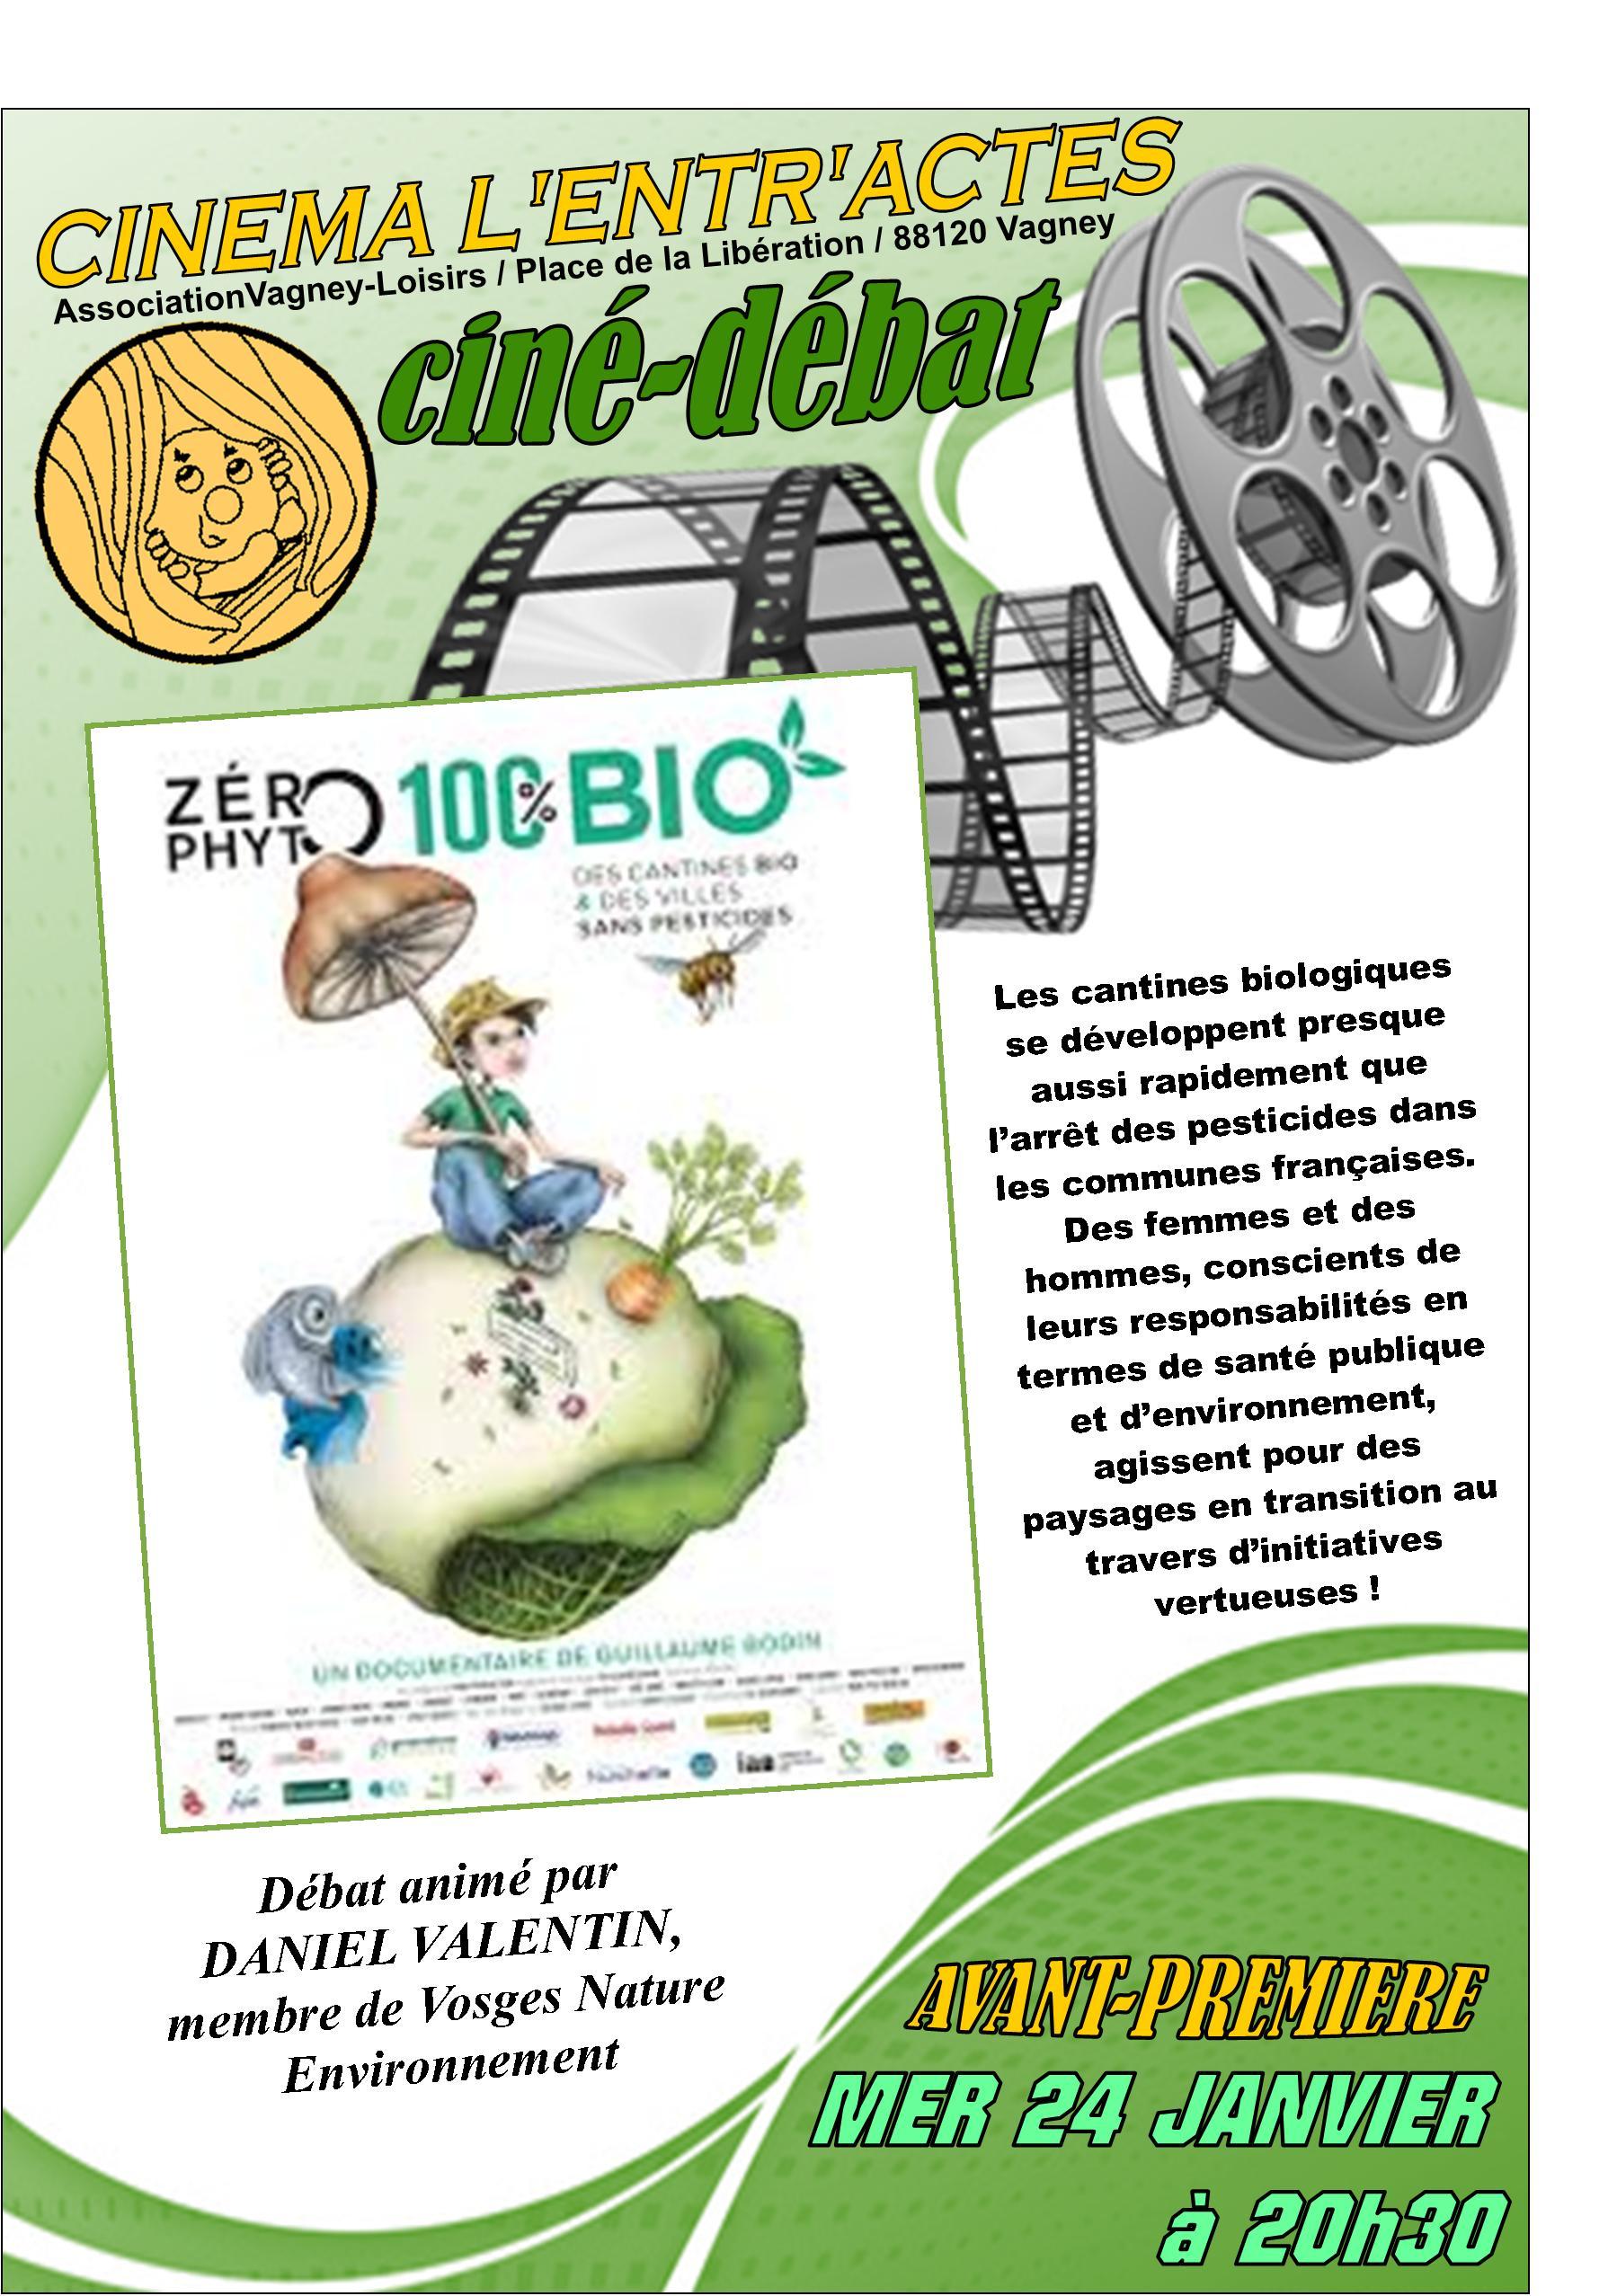 tract cine ZEO PHYTO 100 BIO